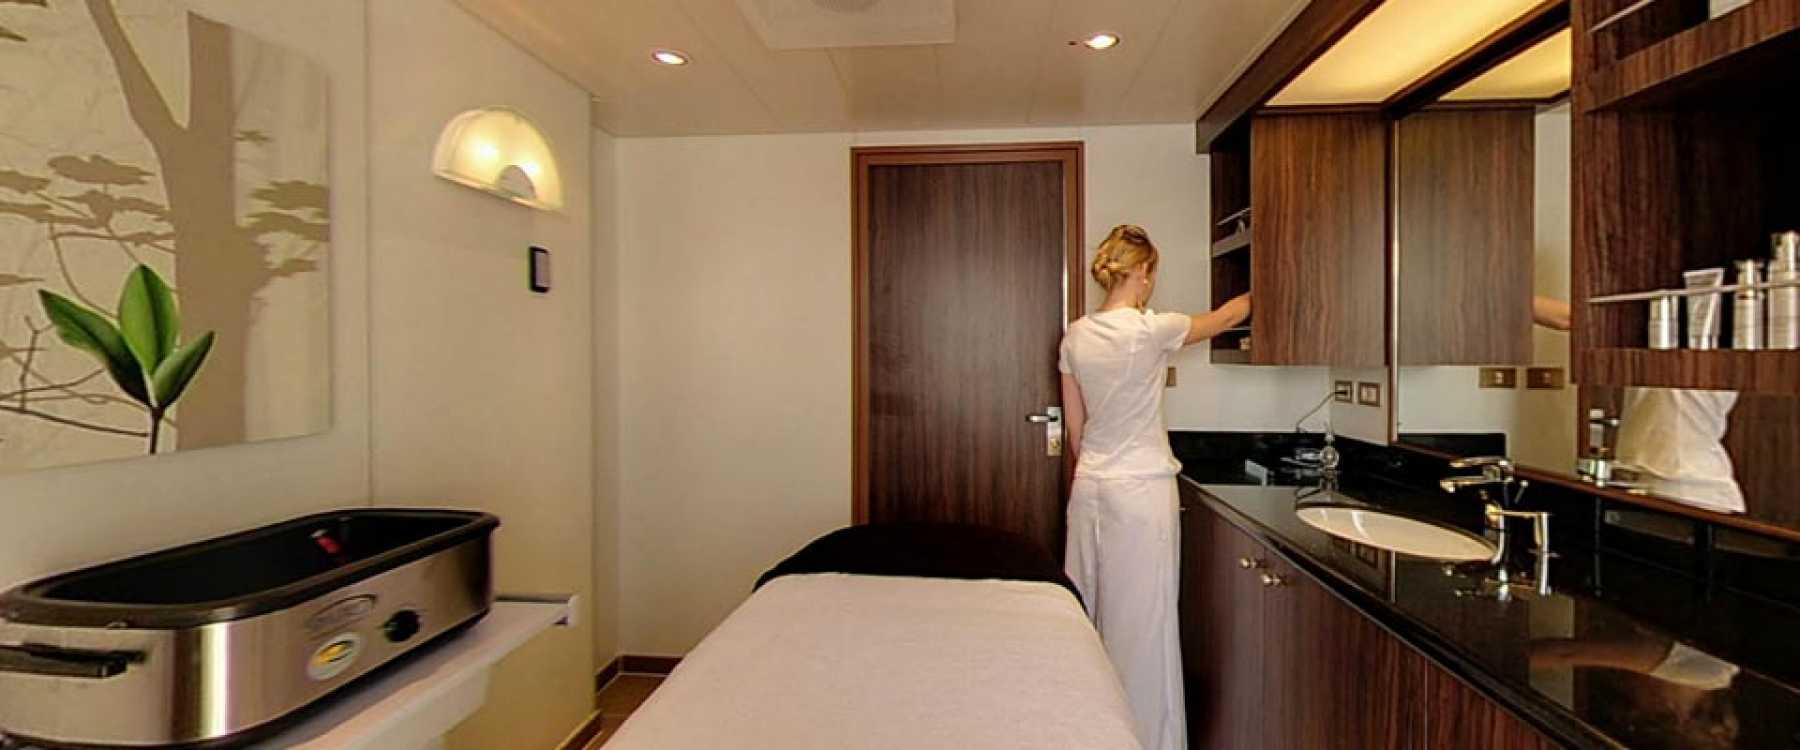 P&O Cruises Azura Interior Spa Treatment Rooms.jpg